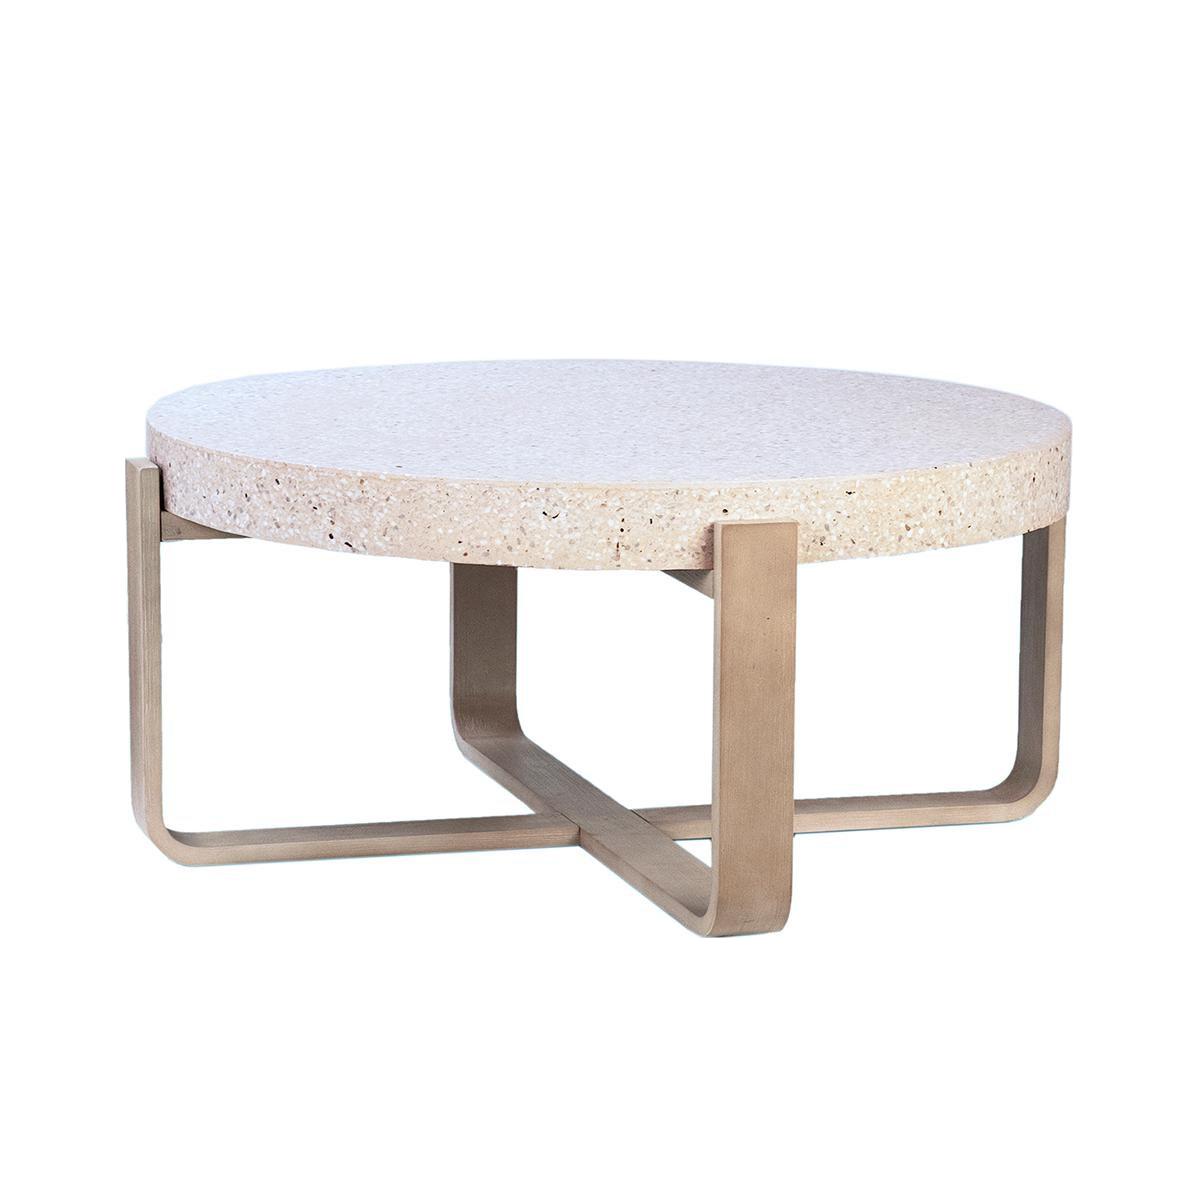 Ivory Terrazzo Wood Coffee Table On Chairish Com [ 1200 x 1200 Pixel ]